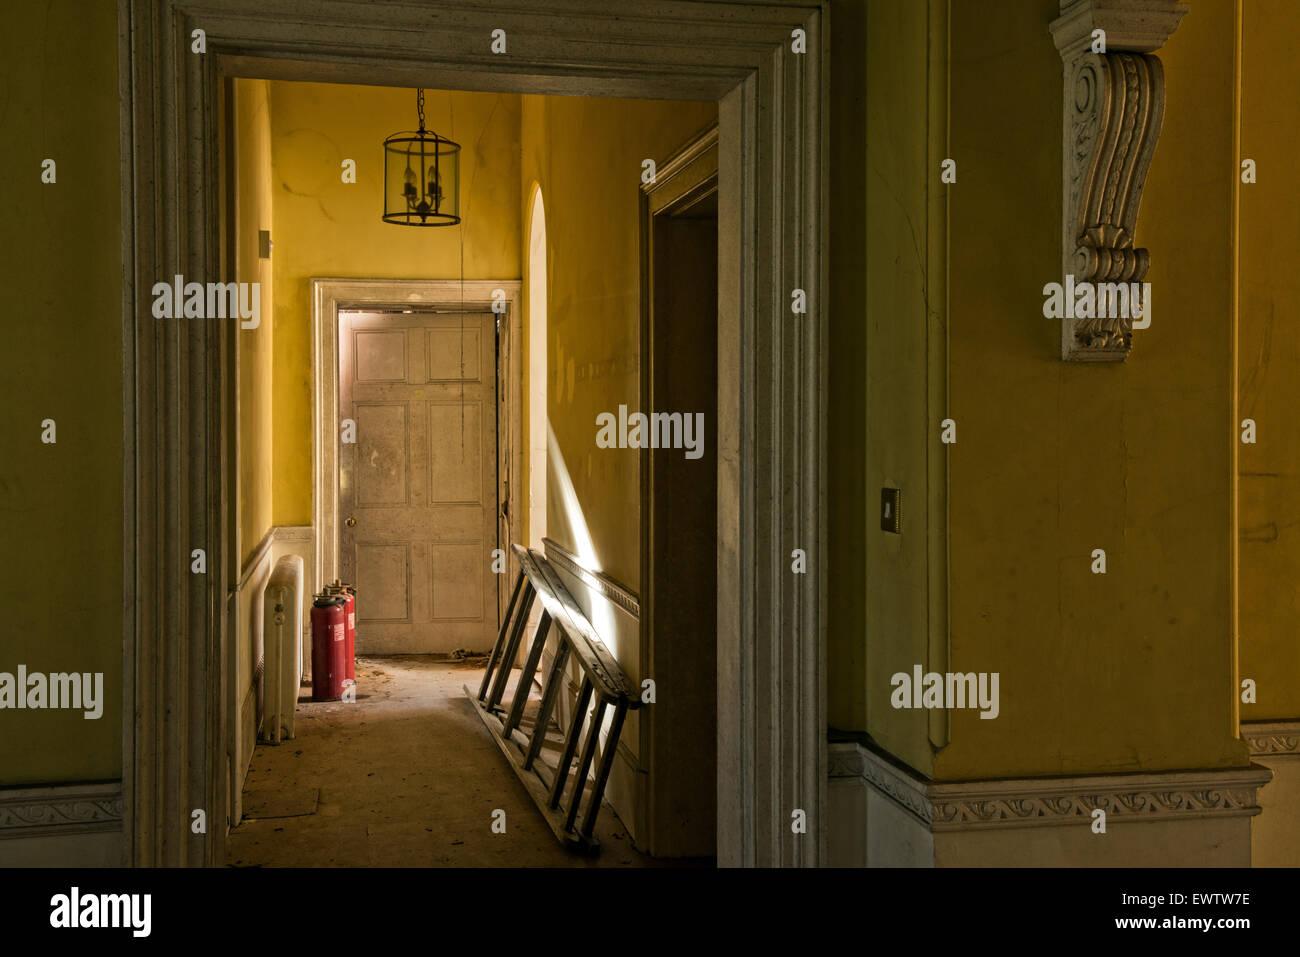 Dentro Silverlands Orfanato, Chertsey, Surrey, Reino Unido Imagen De Stock